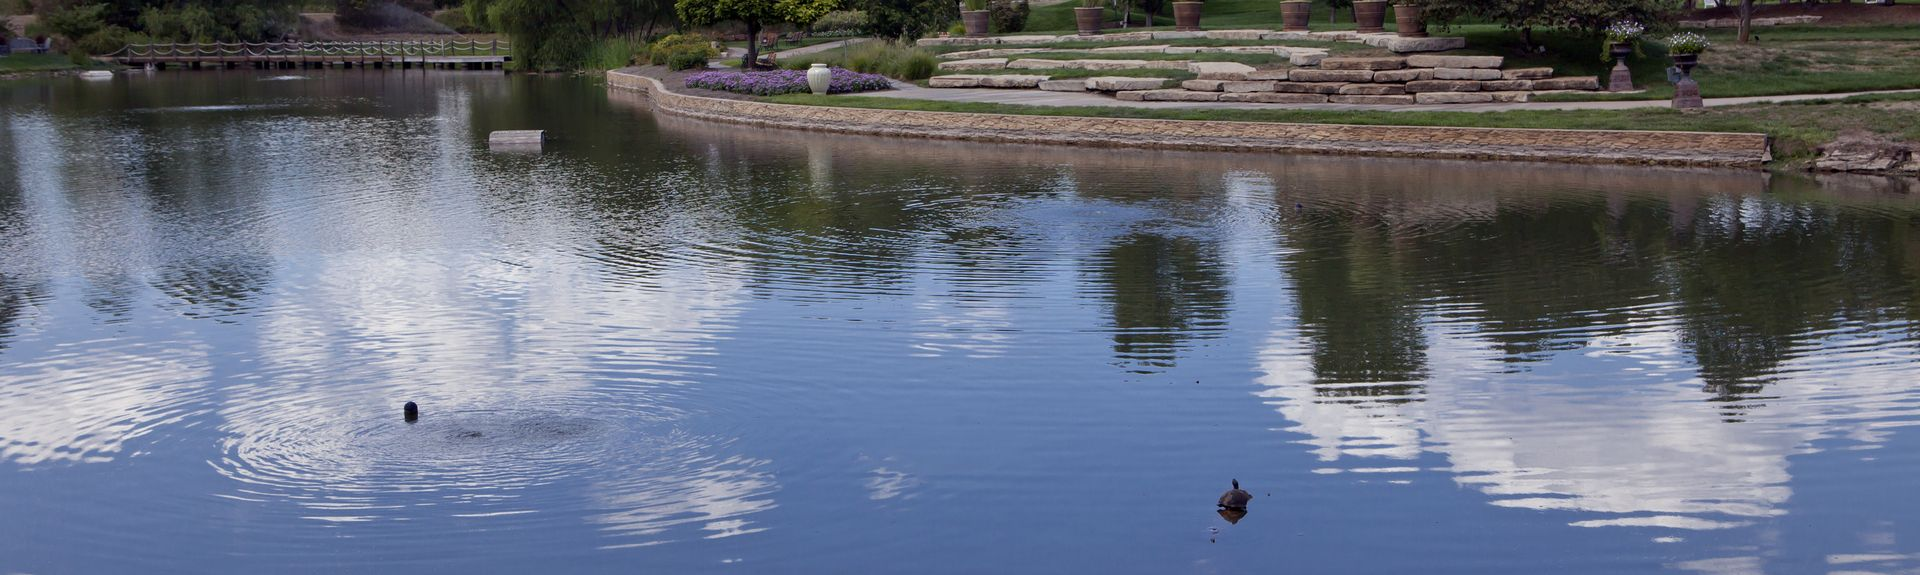 Overland Park, Kansas, Stati Uniti d'America